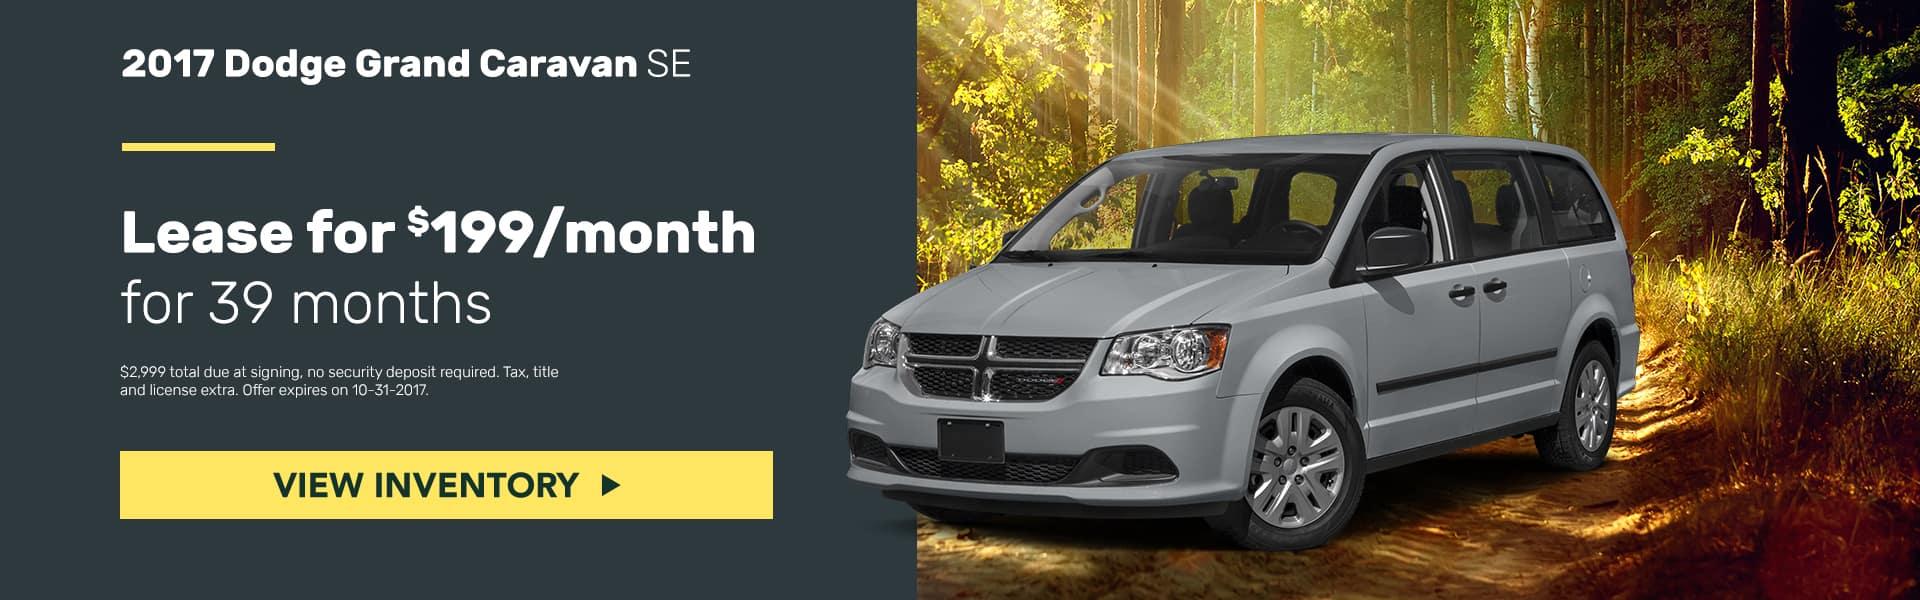 Dodge Grand Caravan October Offer Mancari's